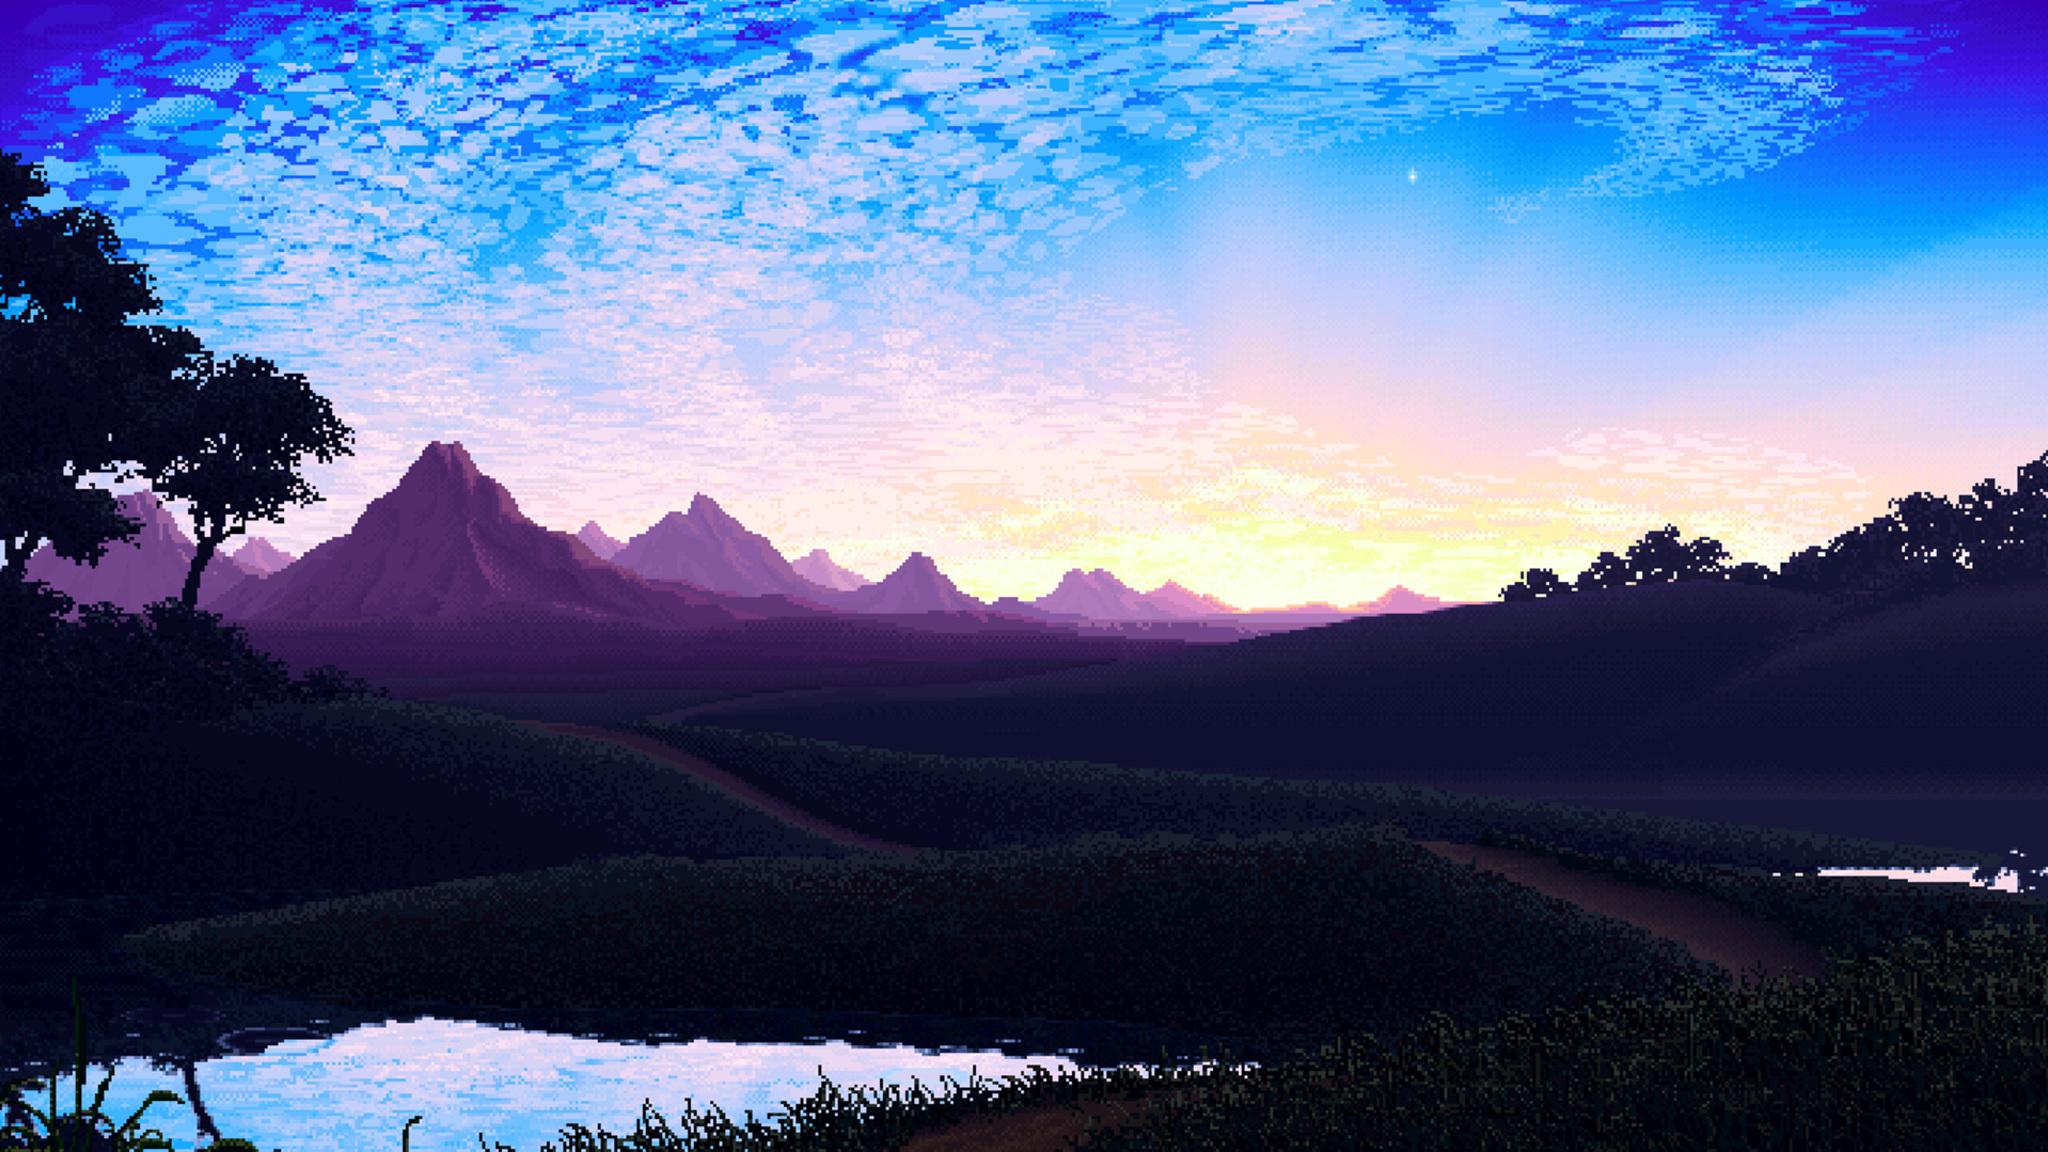 2048x1152 Pixel Landscape 2048x1152 Resolution Hd 4k